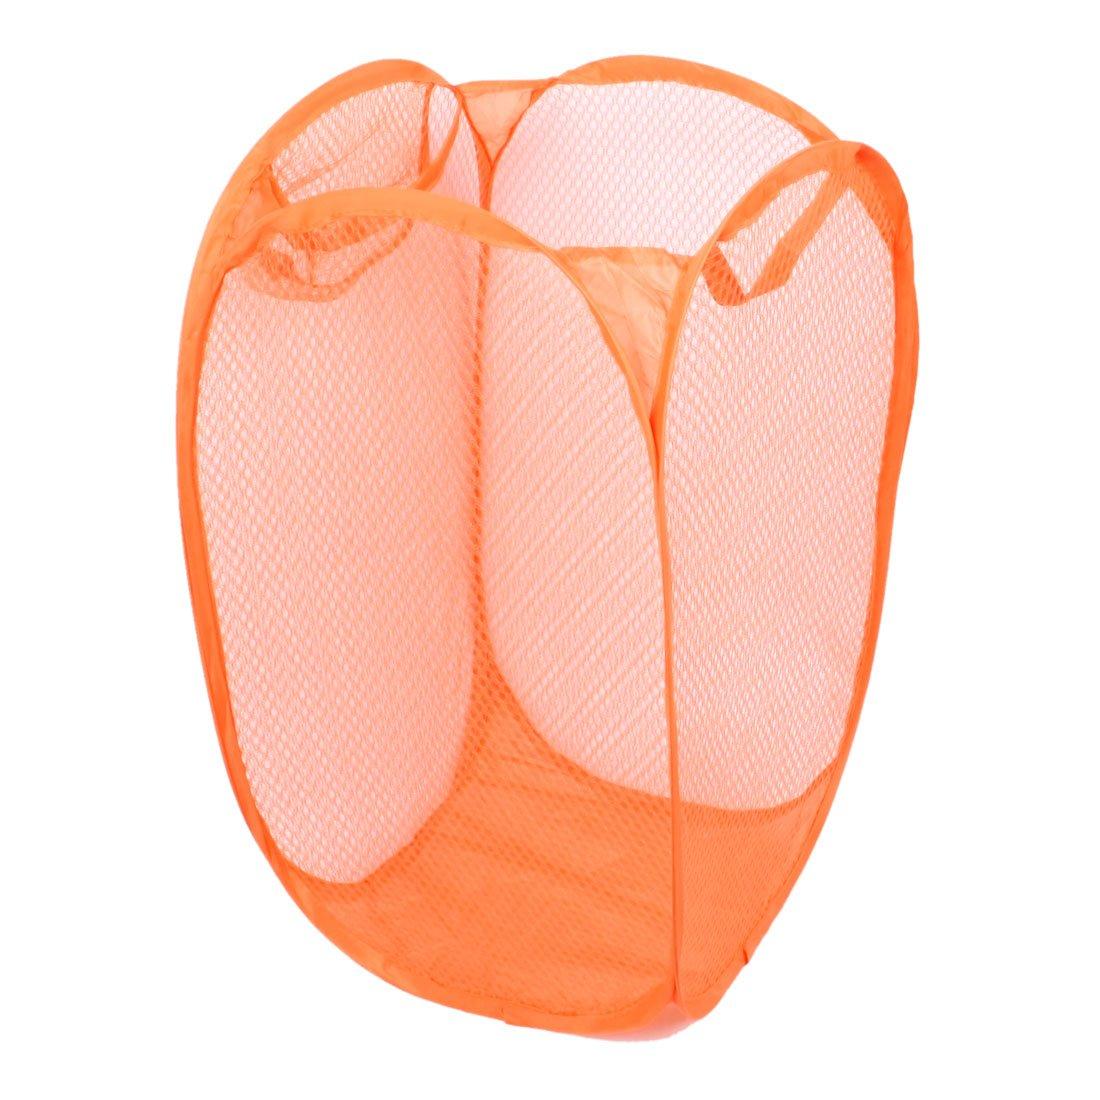 GSFY-Household Dirty Clothes Laundry Folding Mesh Bag Basket Holder Orange